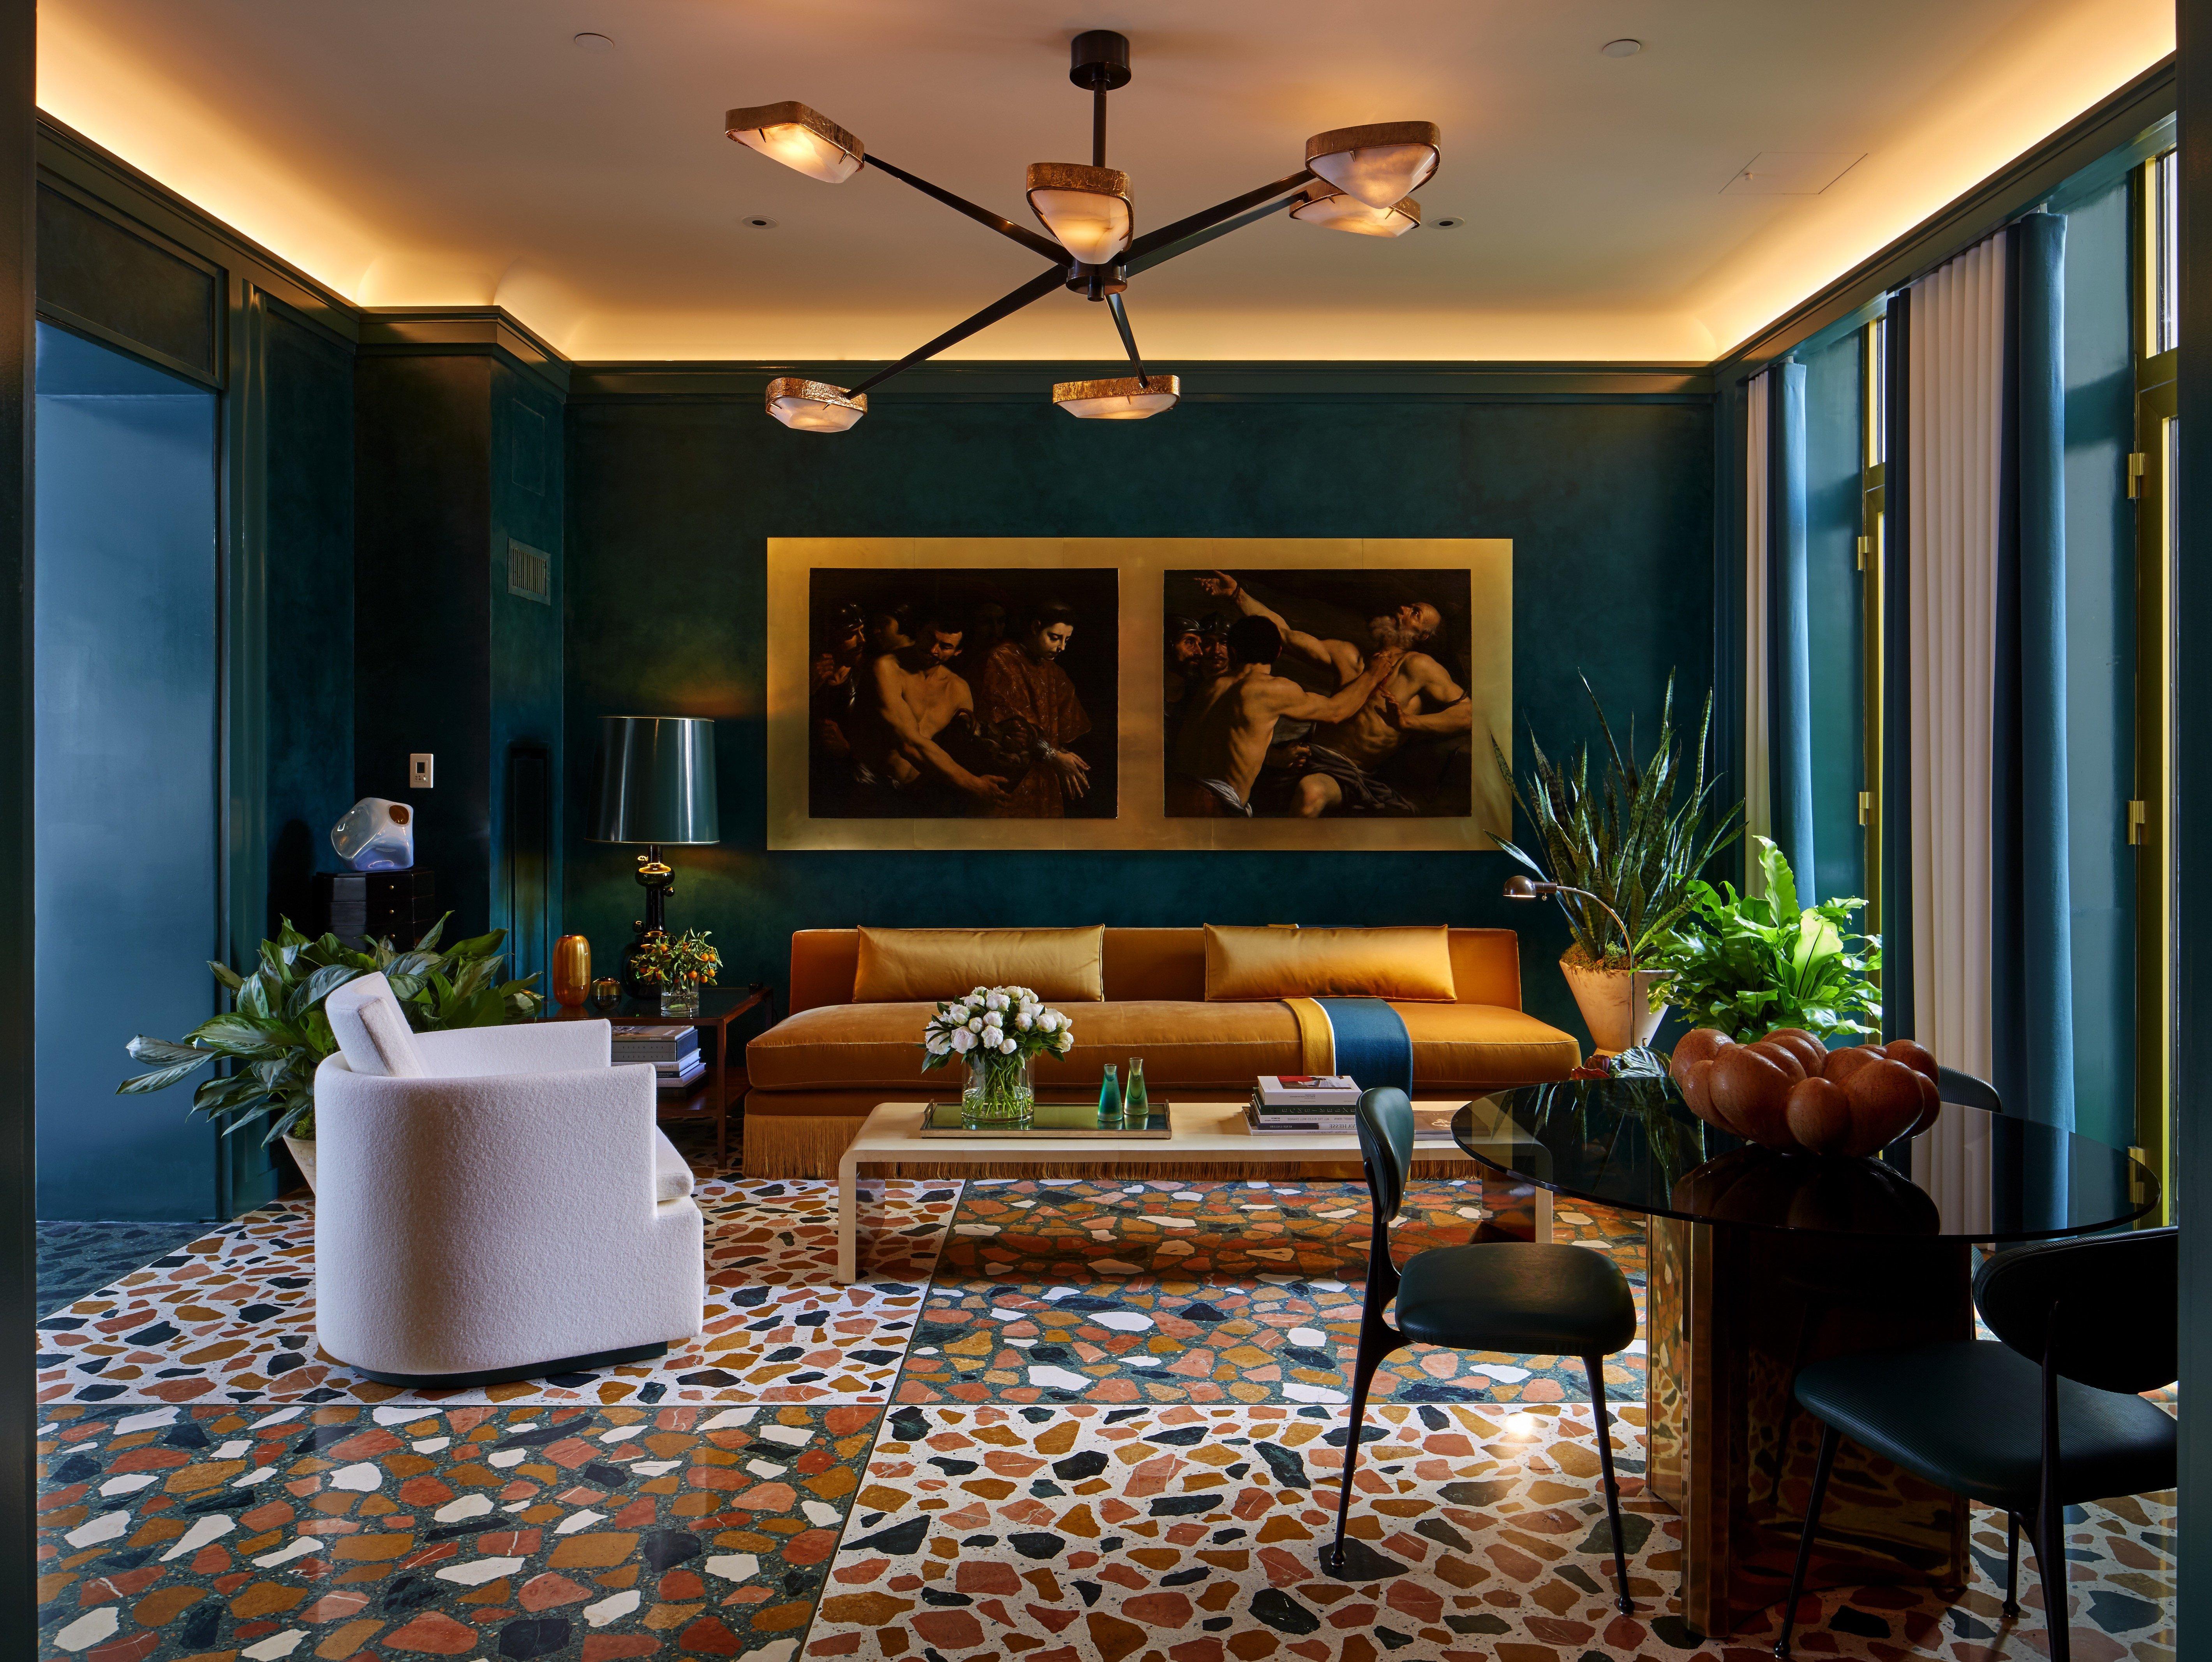 Modern Italian Living Room Decorating Ideas 27 Italian Room Design Ideas to Remind Us the Most